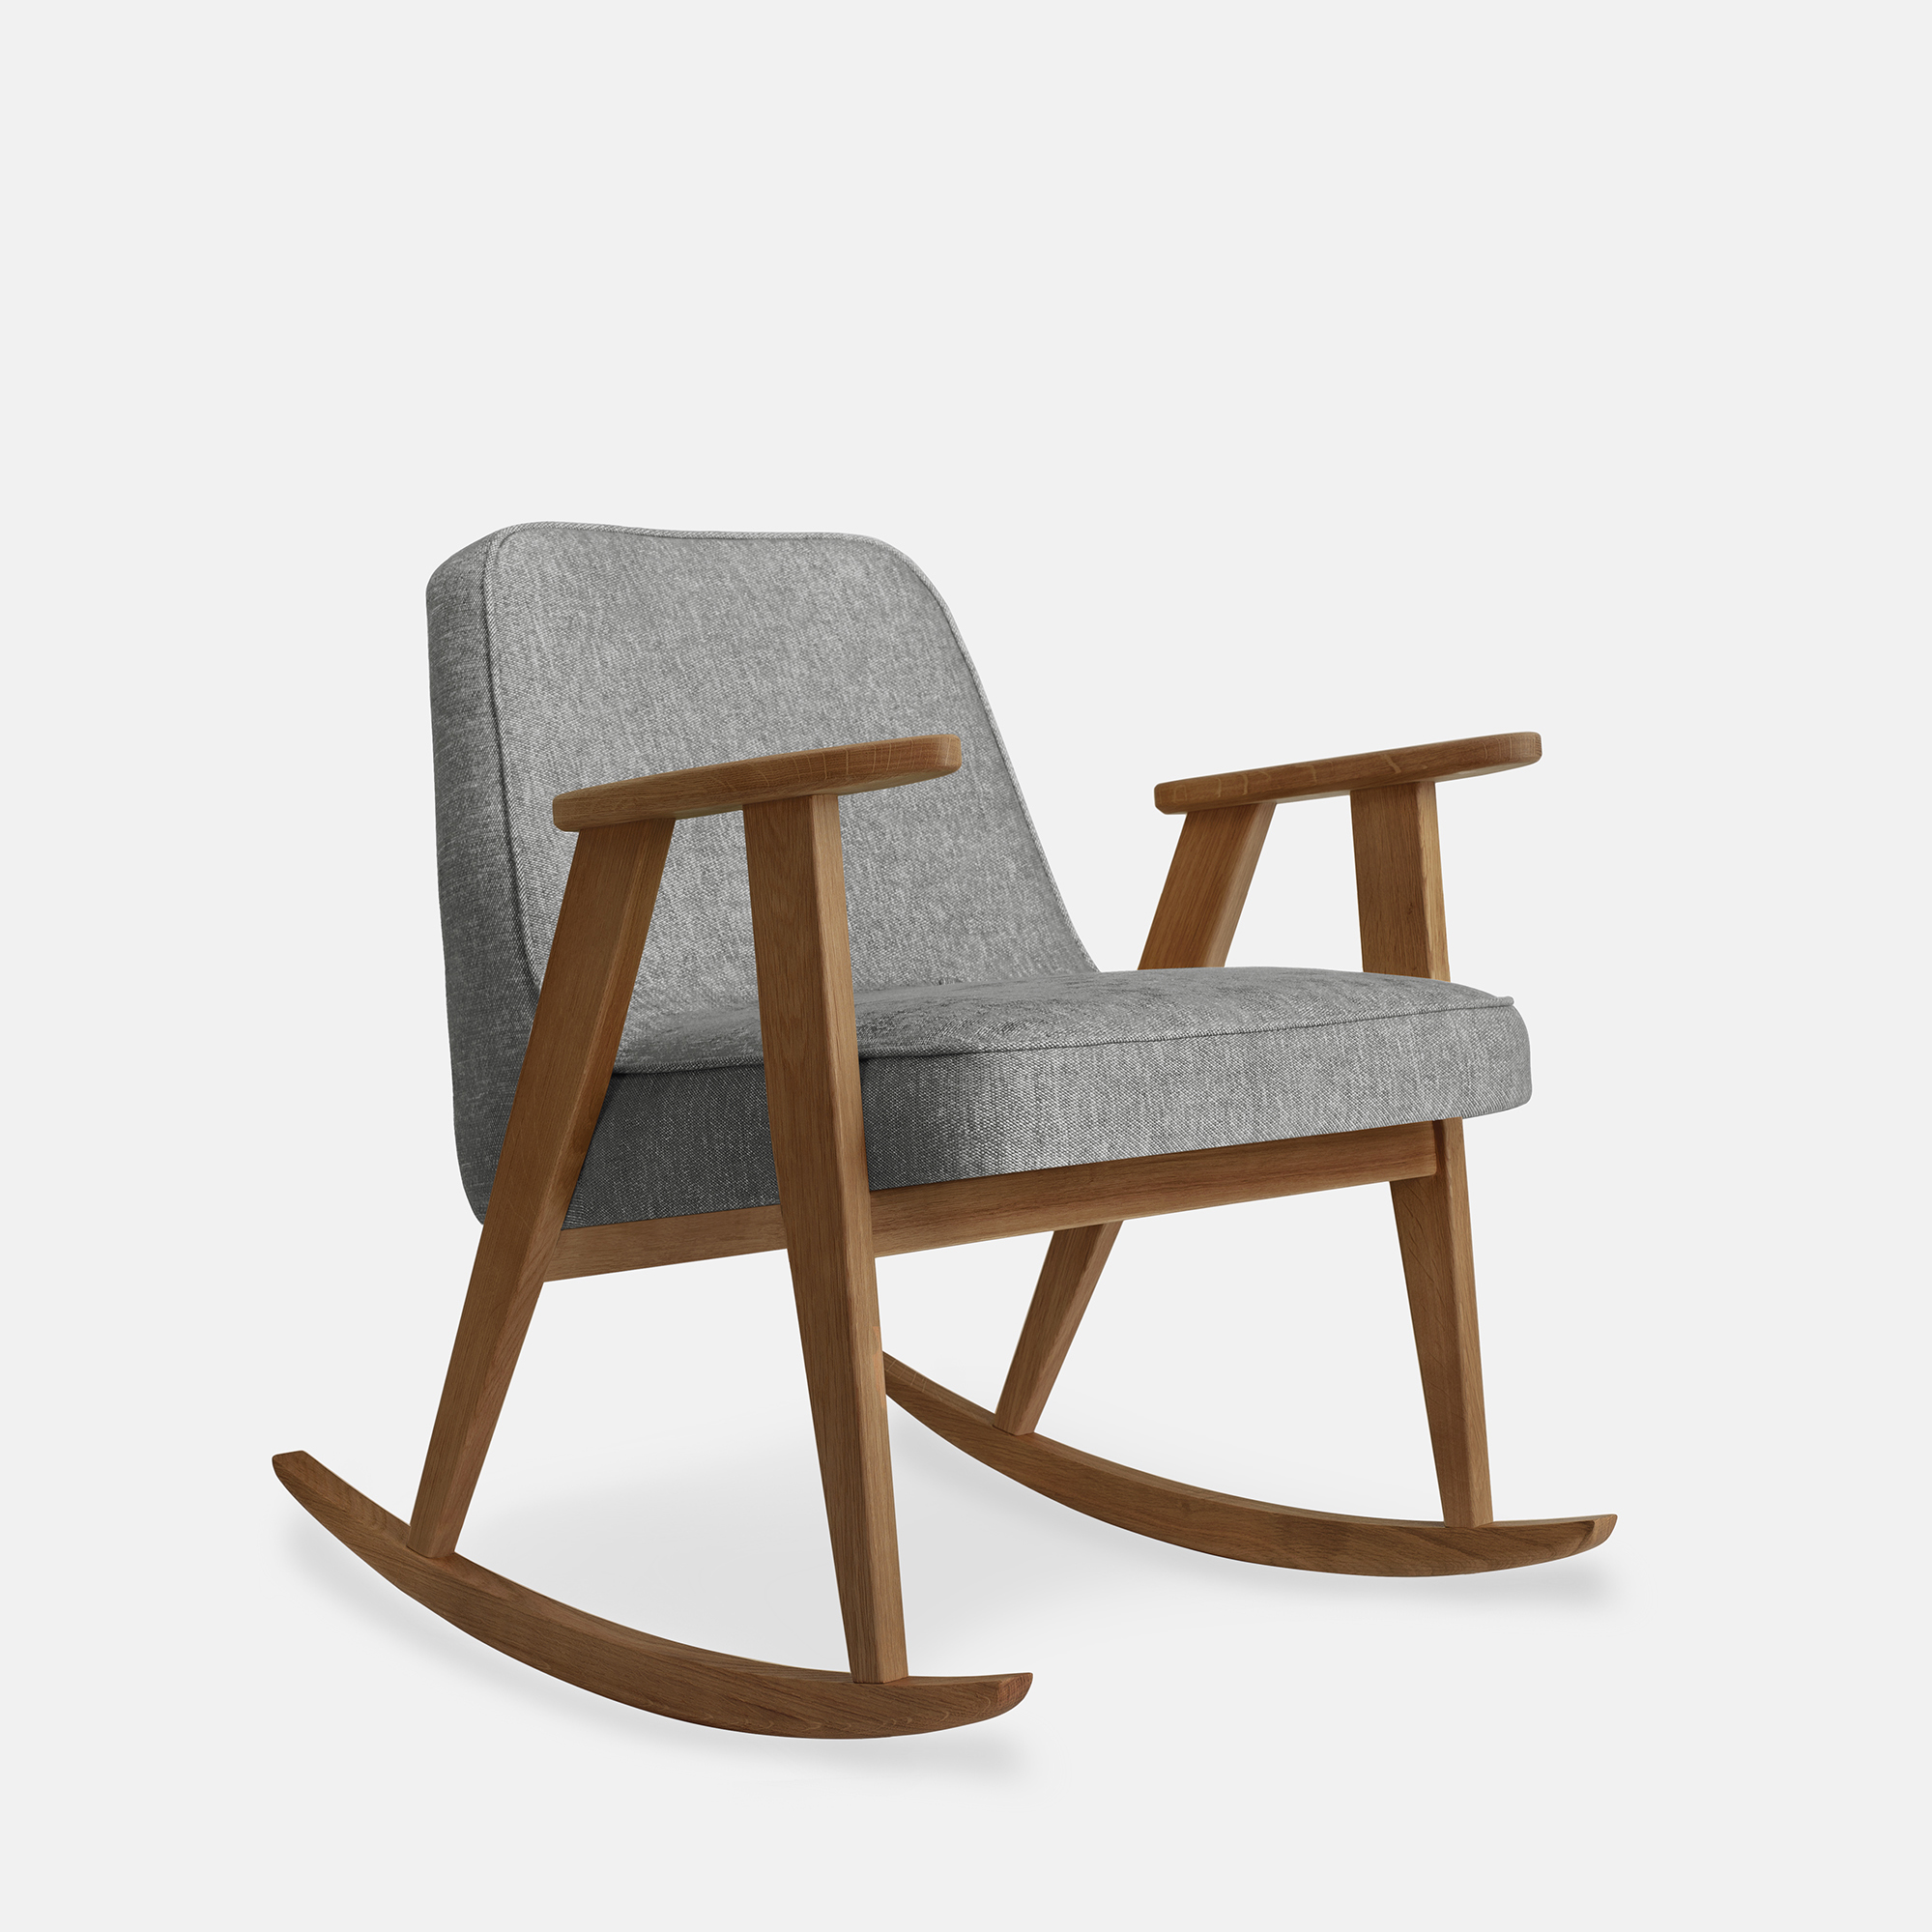 366-Concept-366-Rocking-Chair-W03-Loft-Silver